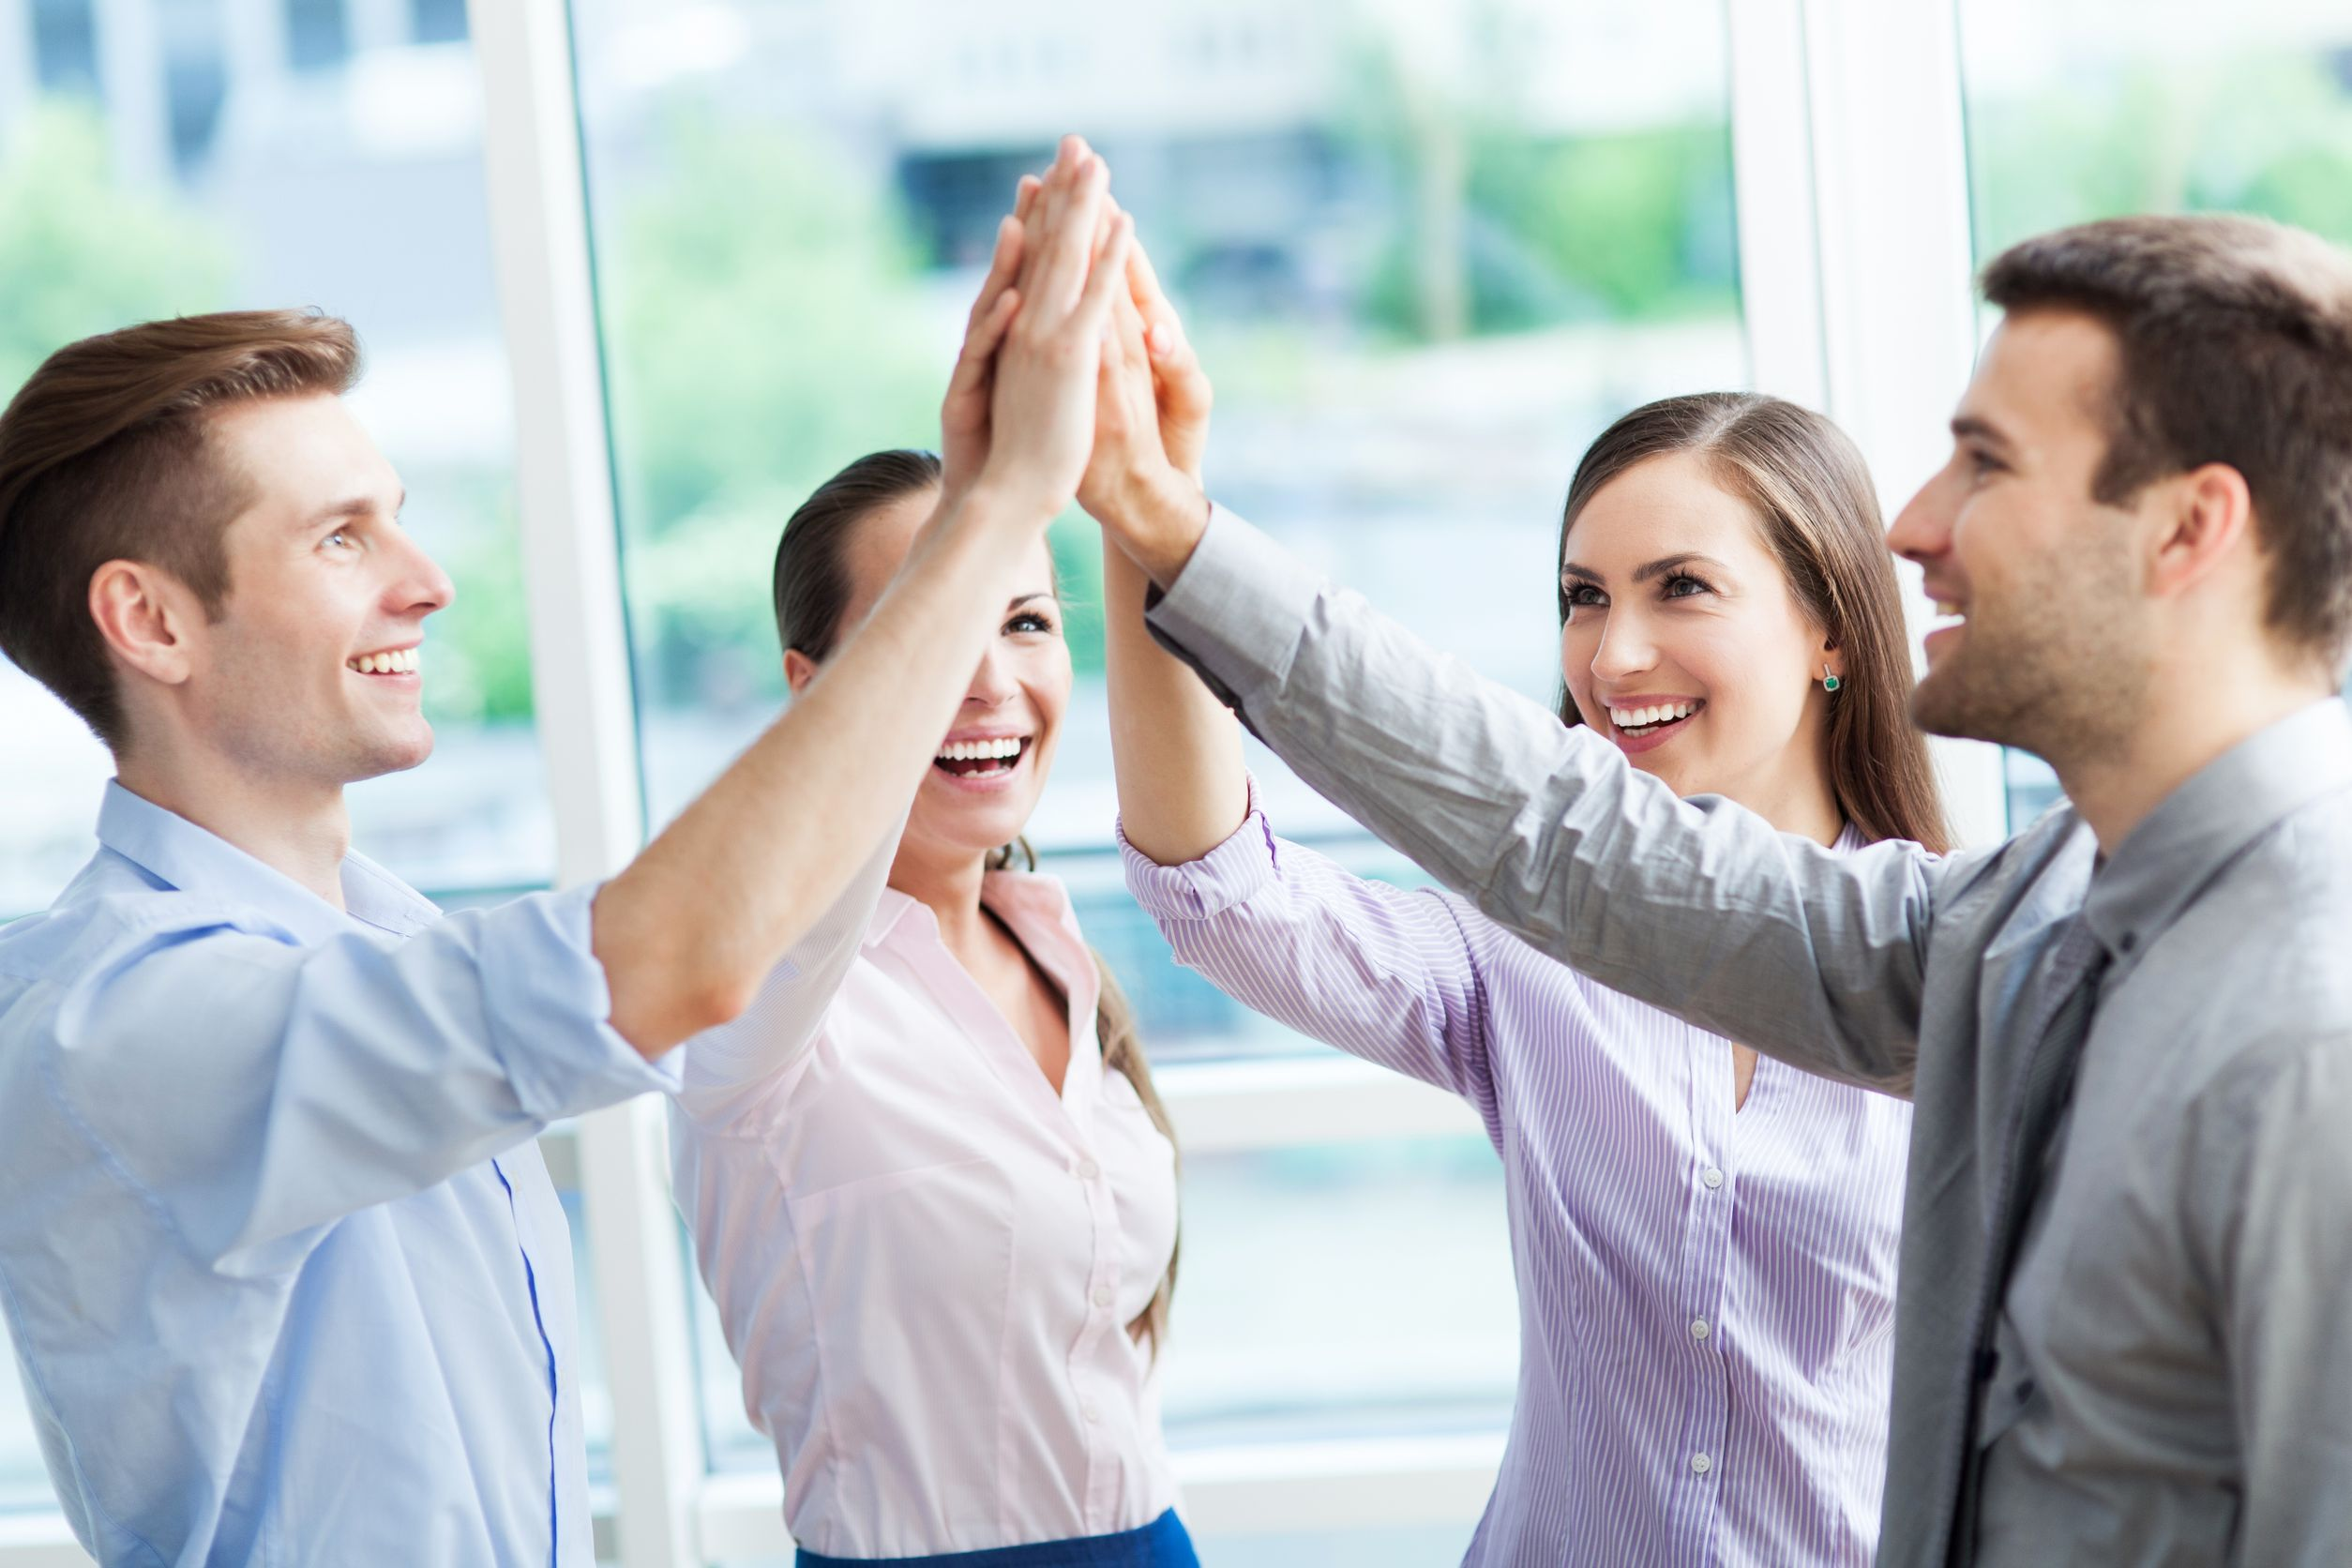 Do you have an unhappy workforce?